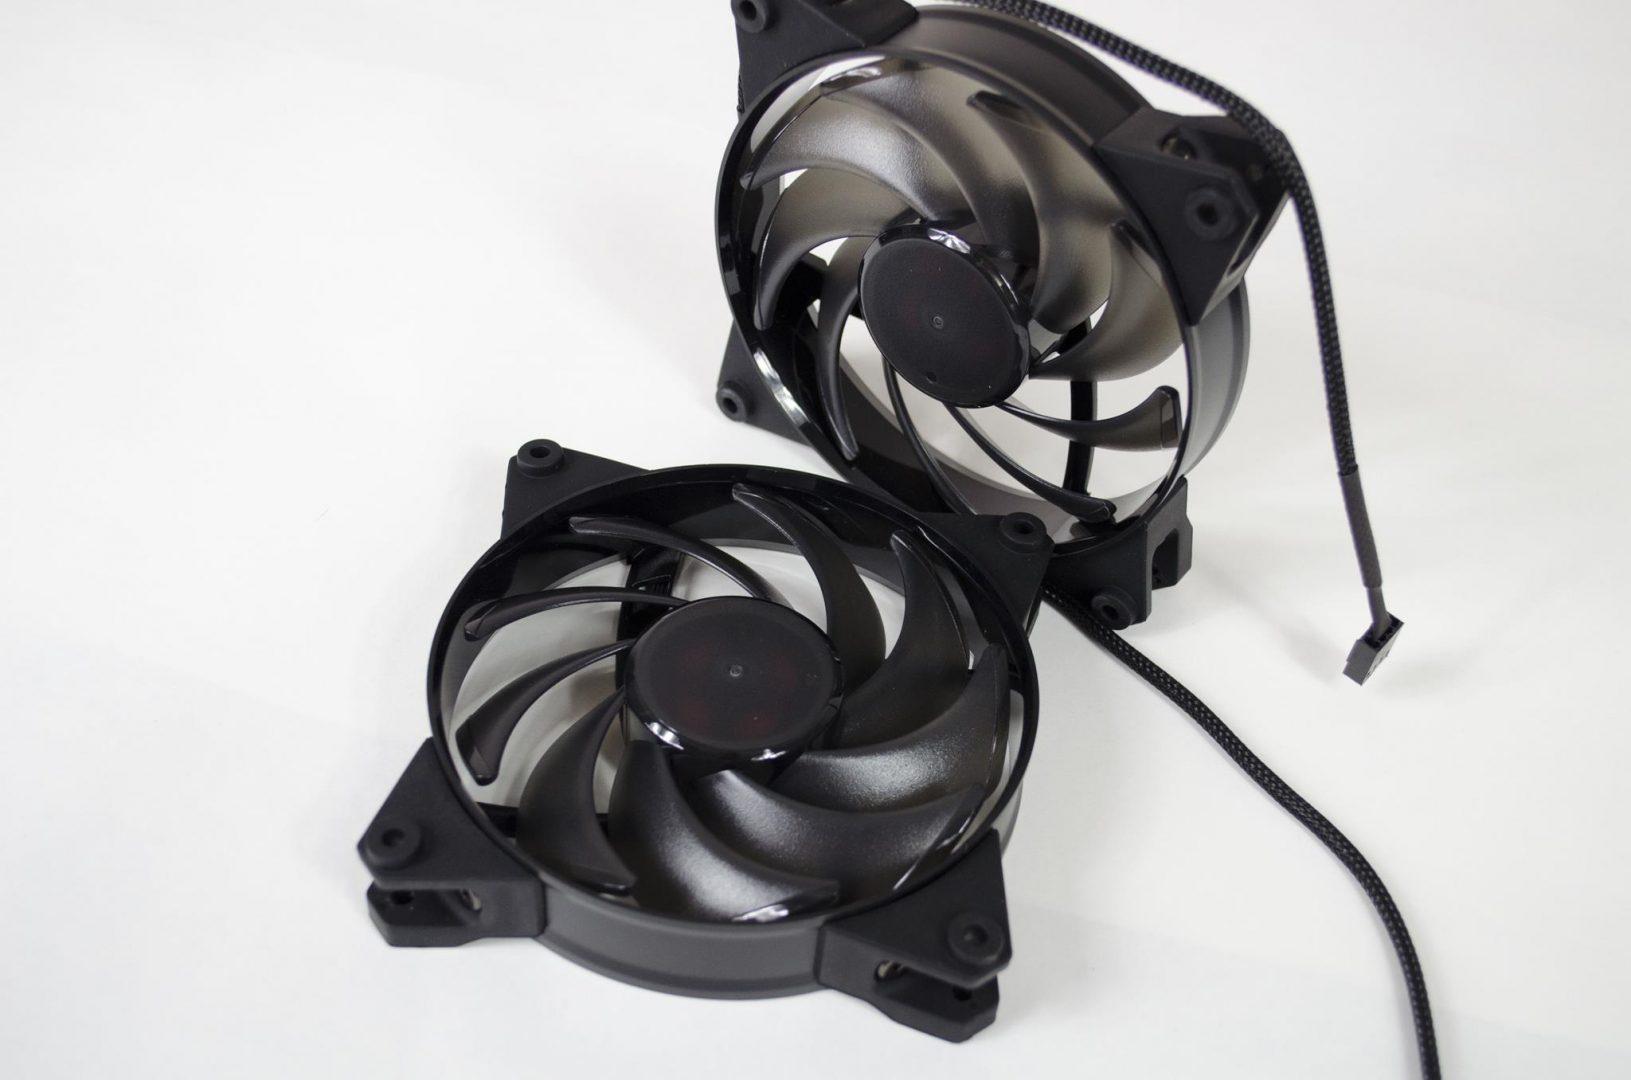 cooler-master-masterliuqid-pro-120_5